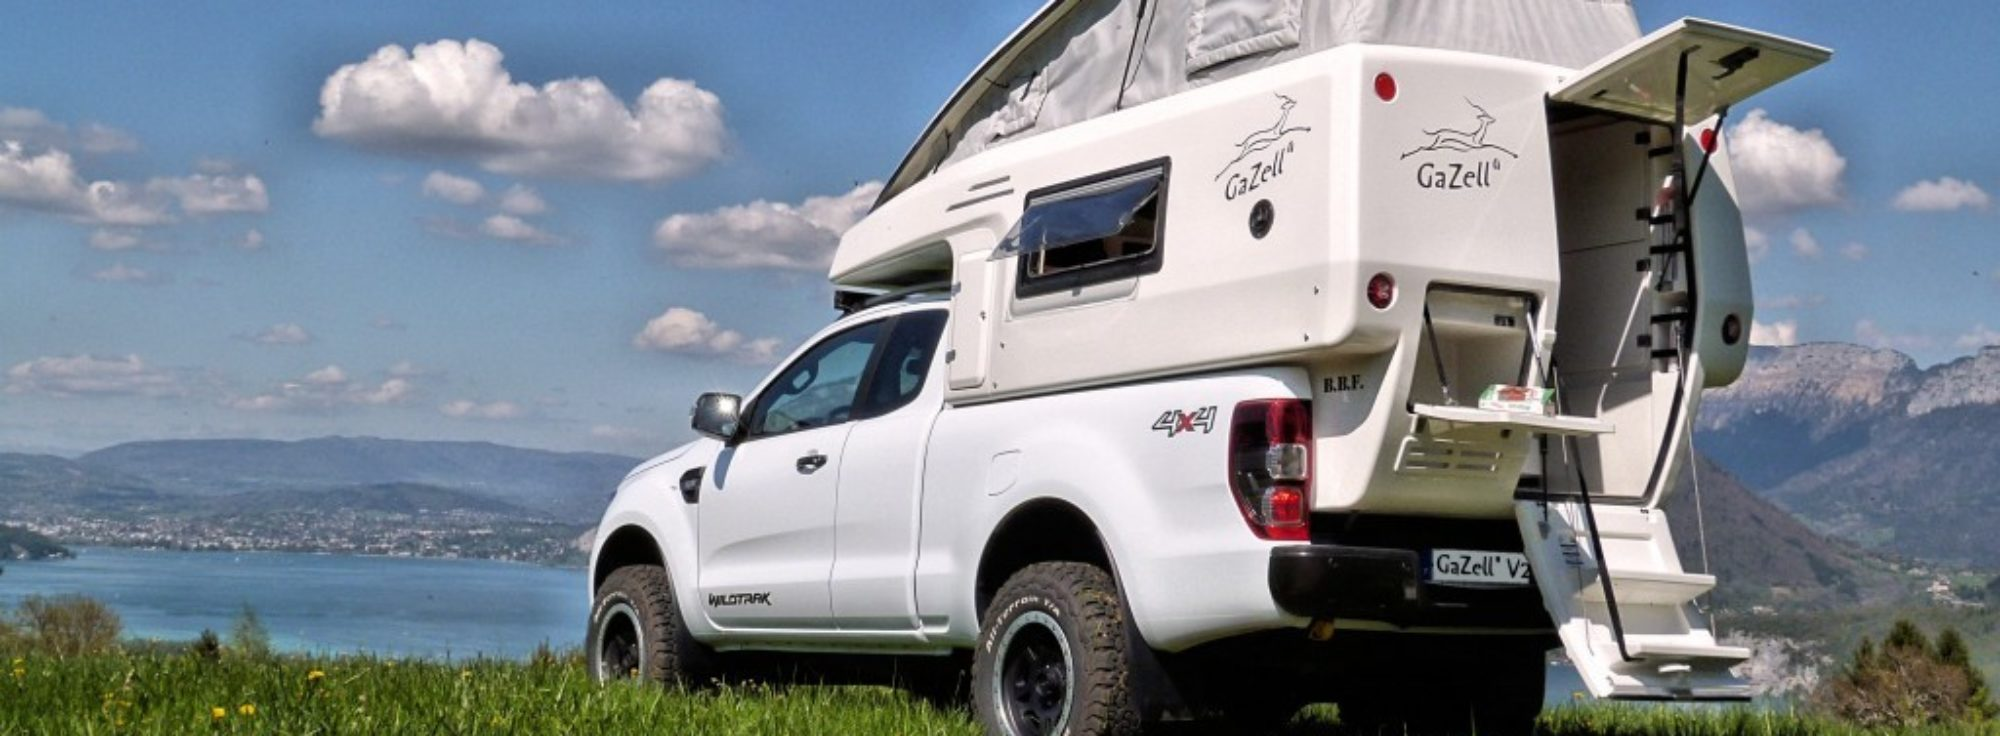 SBS Adventure Campers UK